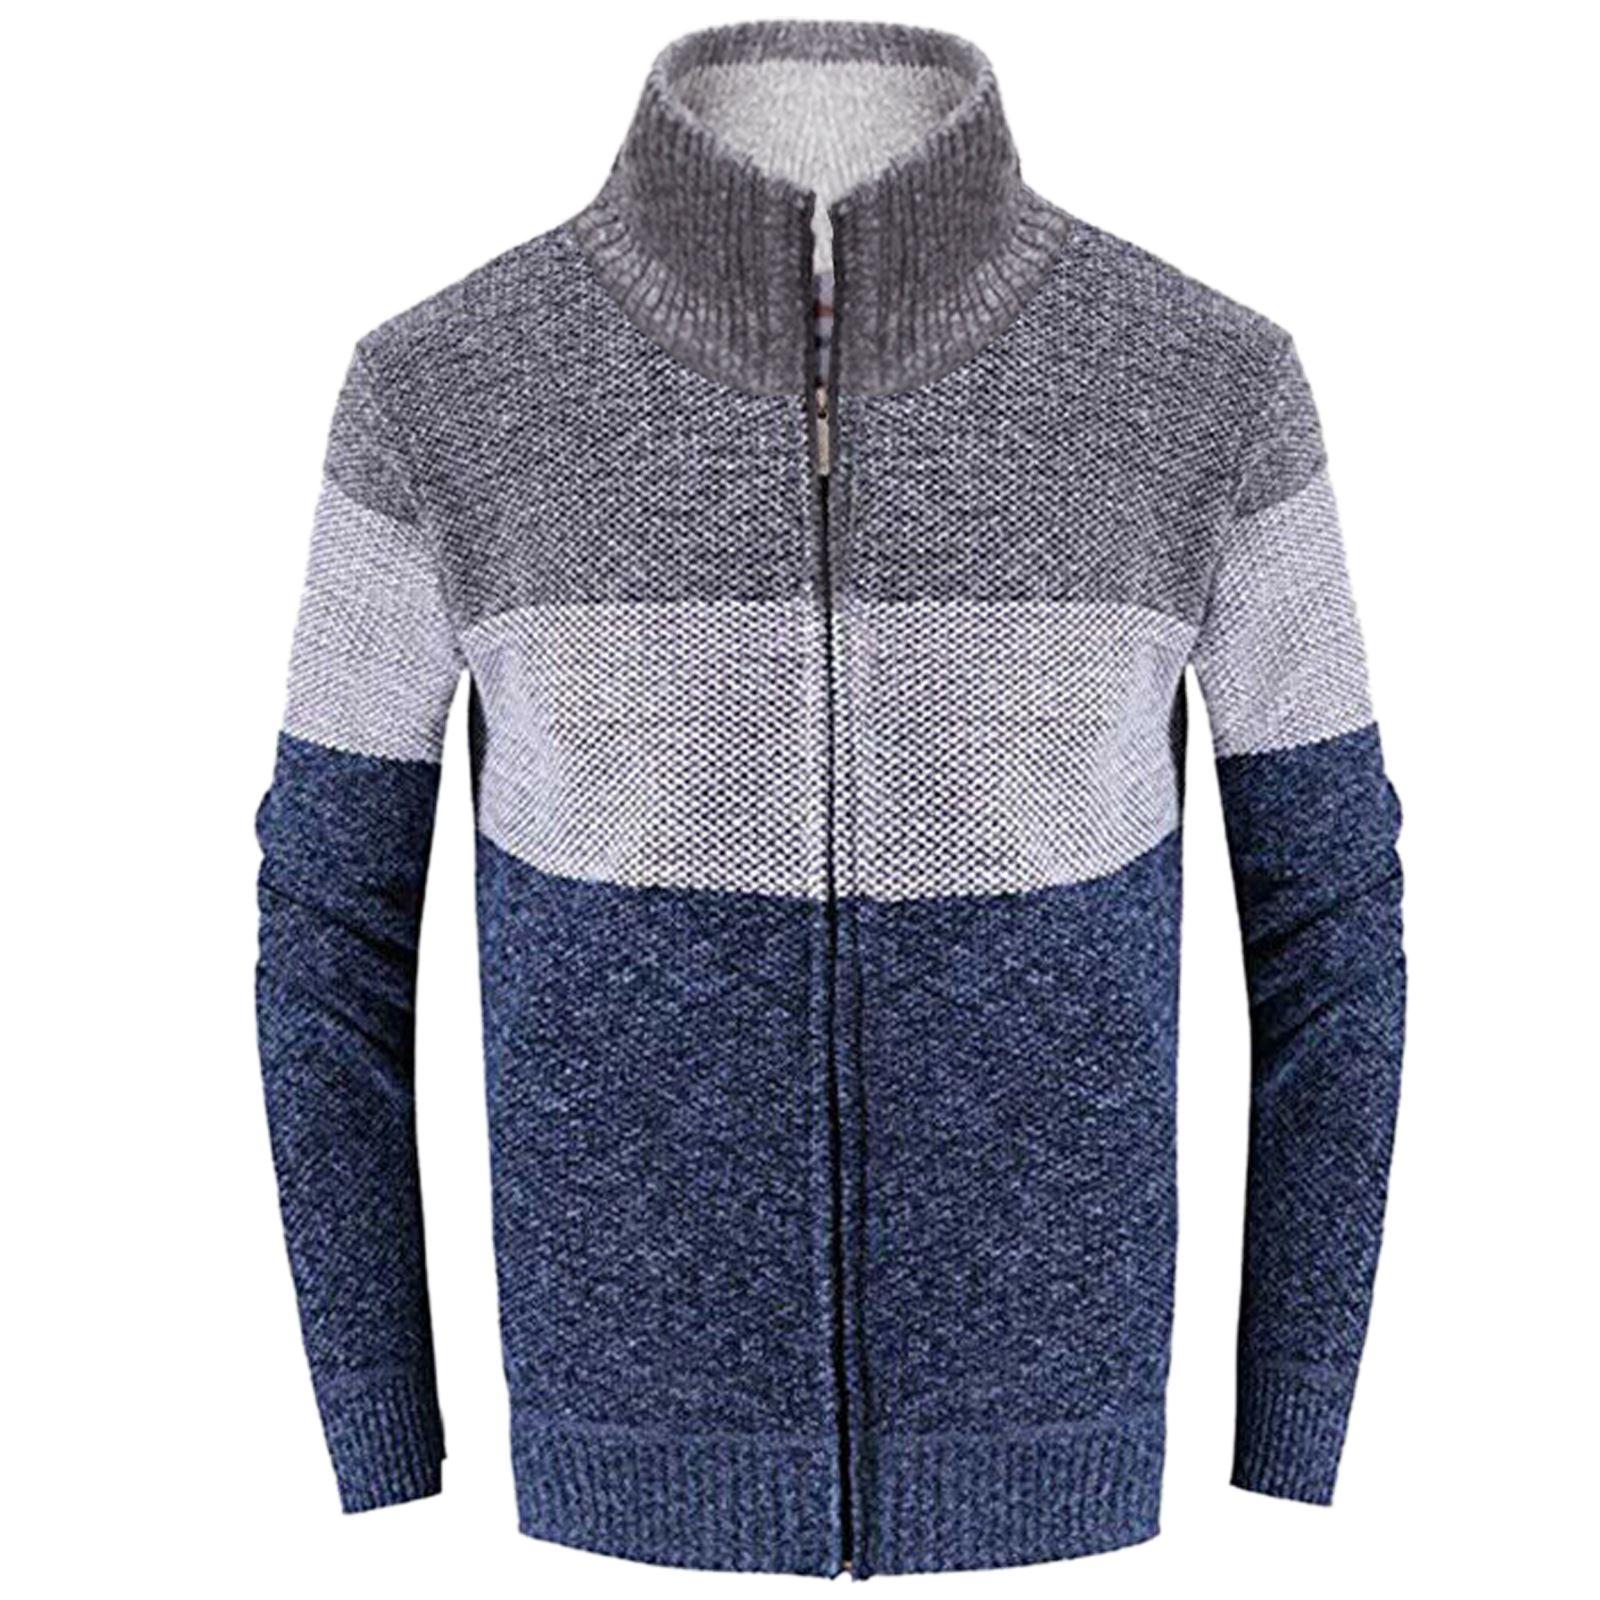 Mens-Winter-Warm-Fleece-Lined-Sweater-Knitted-Striped-Zip-Thru-Cardigan-Jumper thumbnail 3